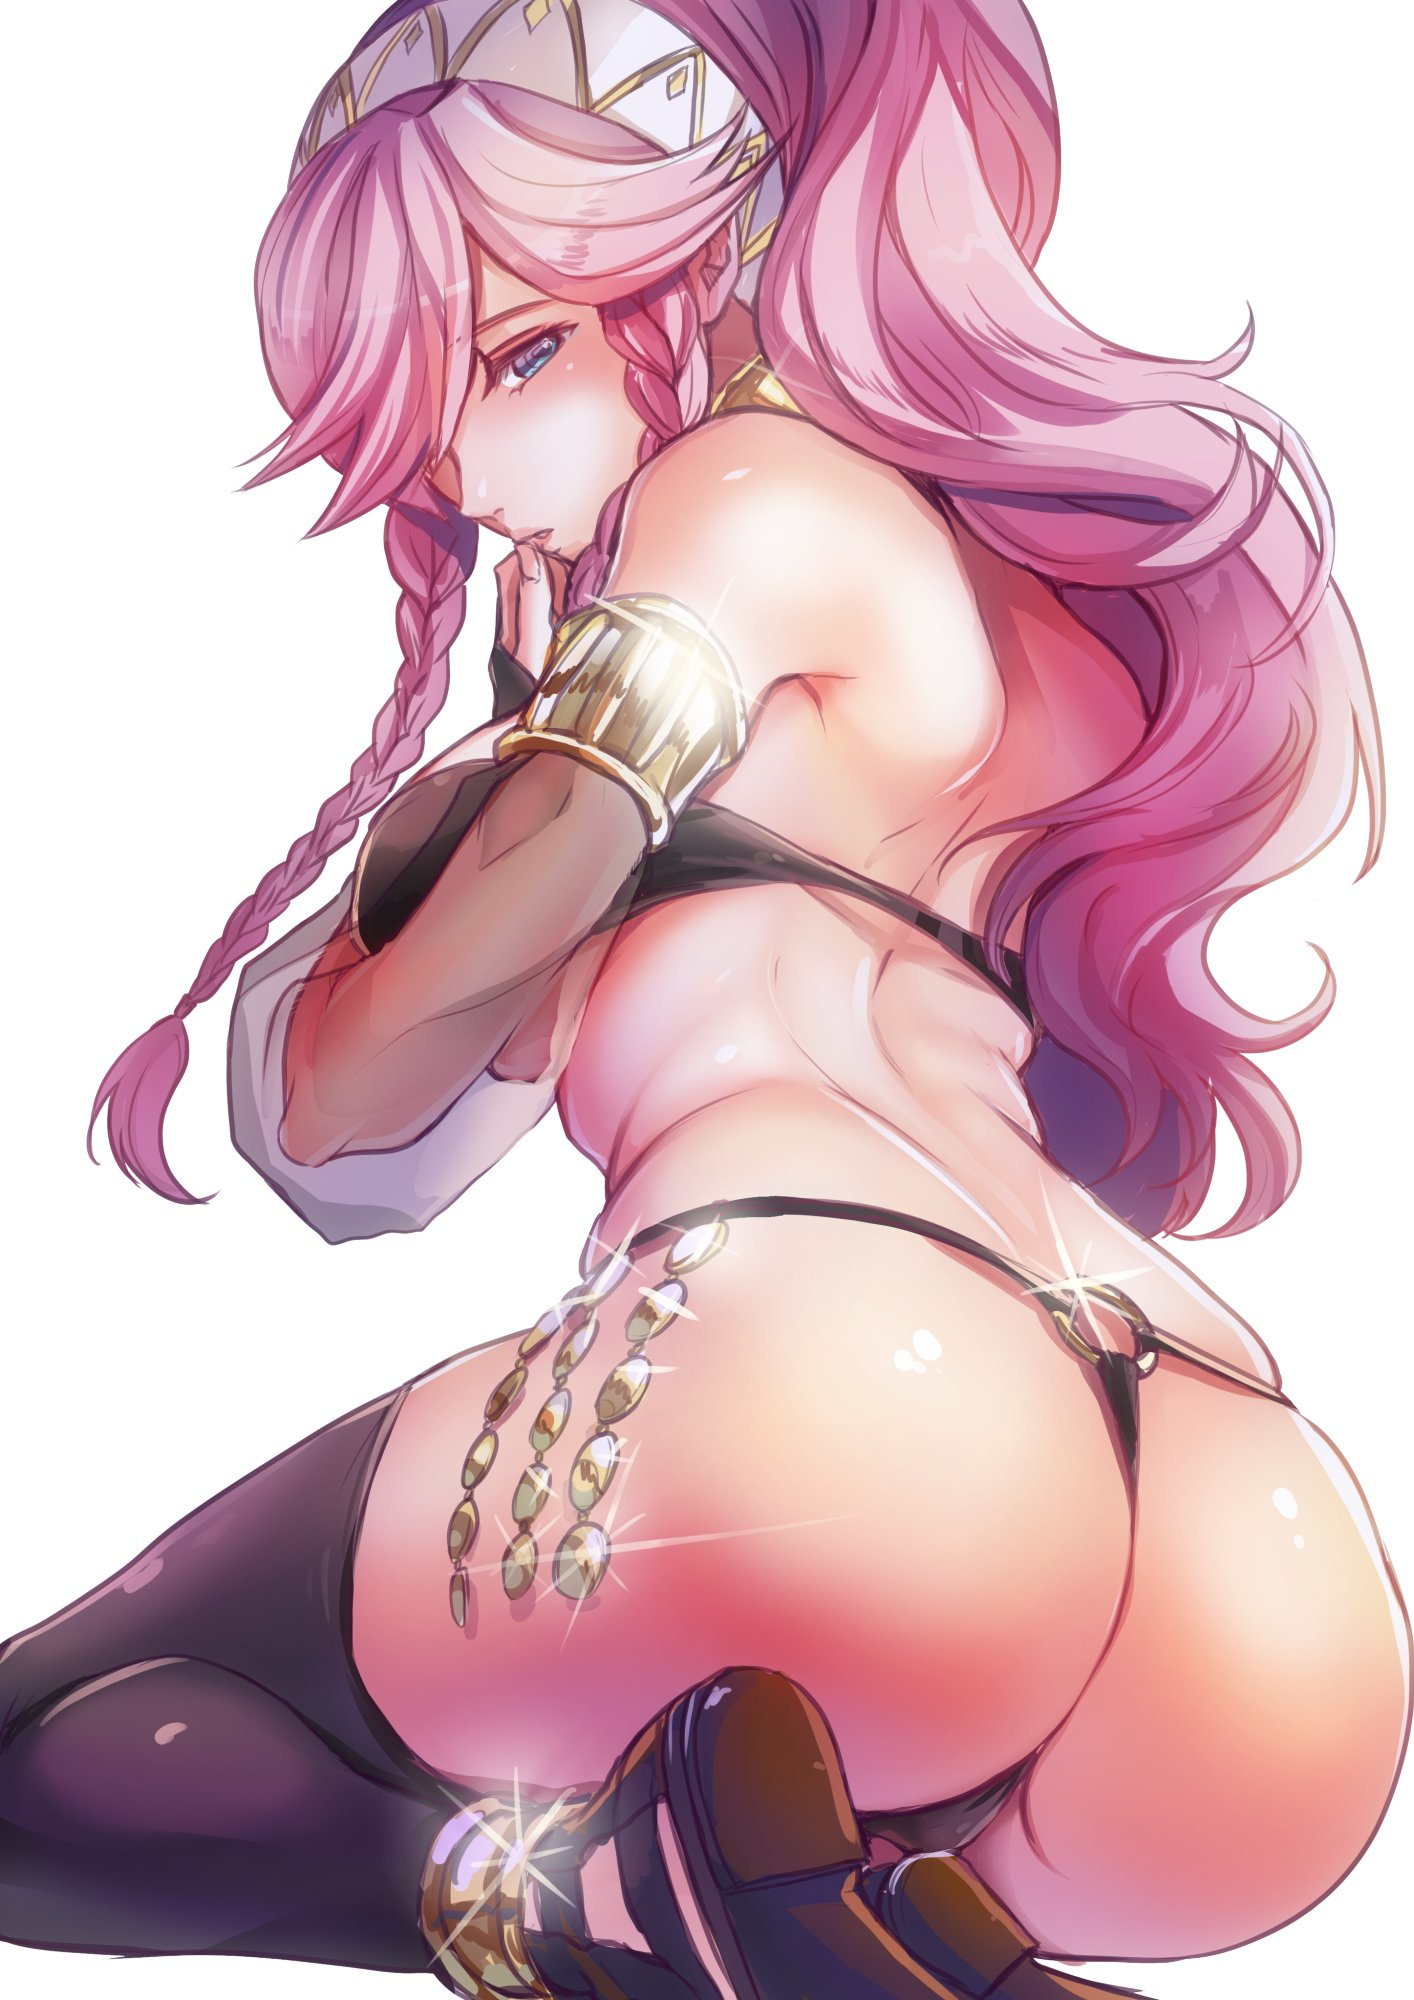 sexy japanese girl in lingerie naked